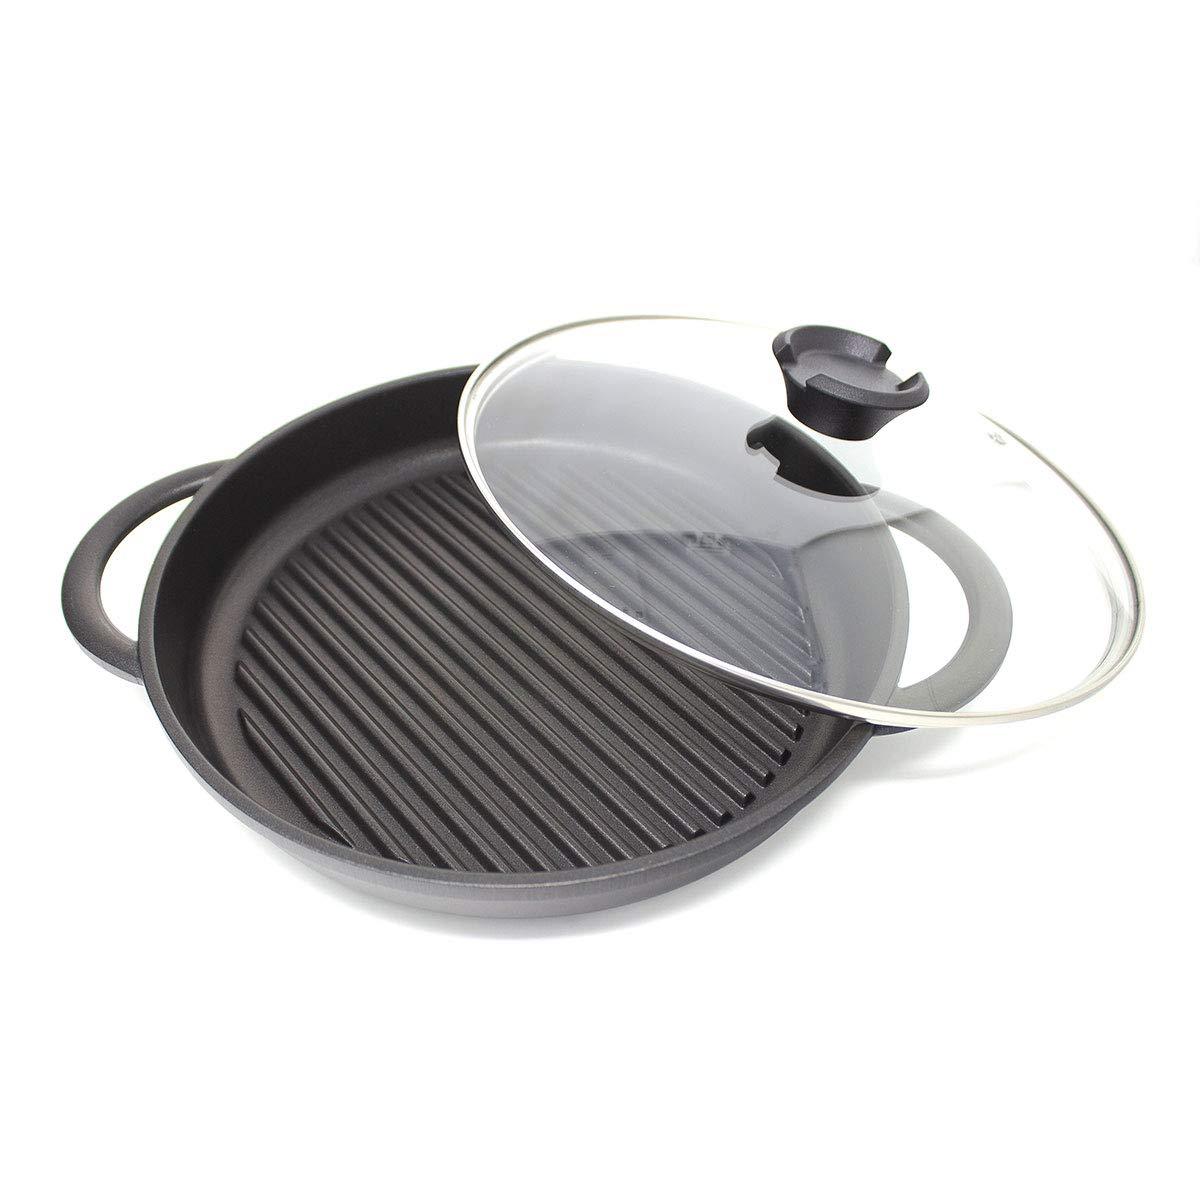 Jean Patrique The Whatever Pan - Cast Aluminium Griddle Pan with Glass Lid